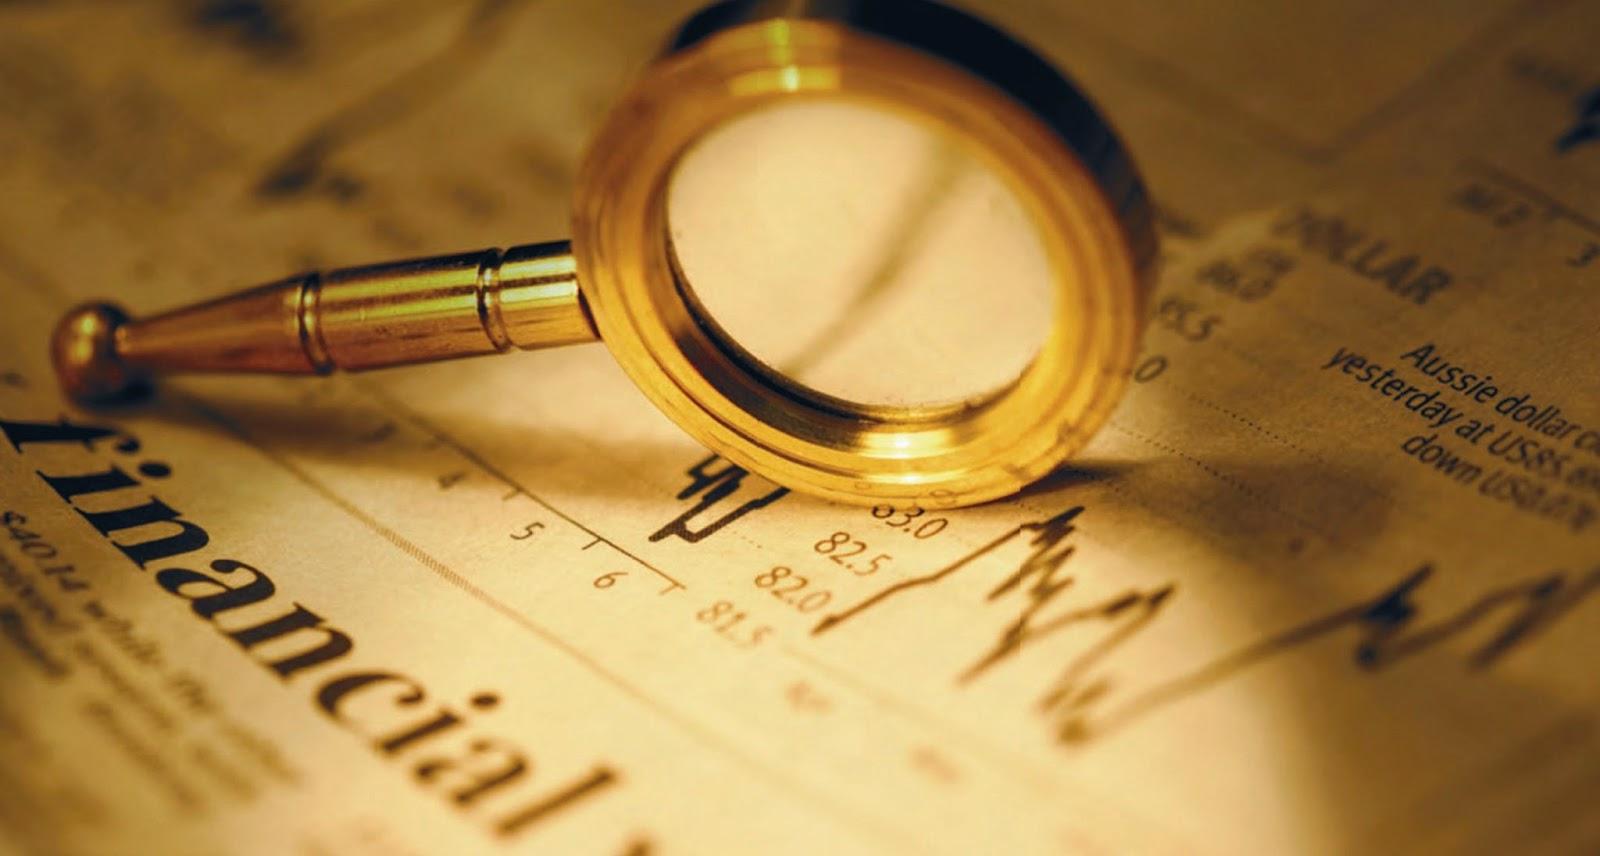 kenneth rijock s financial crime blog 2014 alert for bank regulatory repair fraudsters